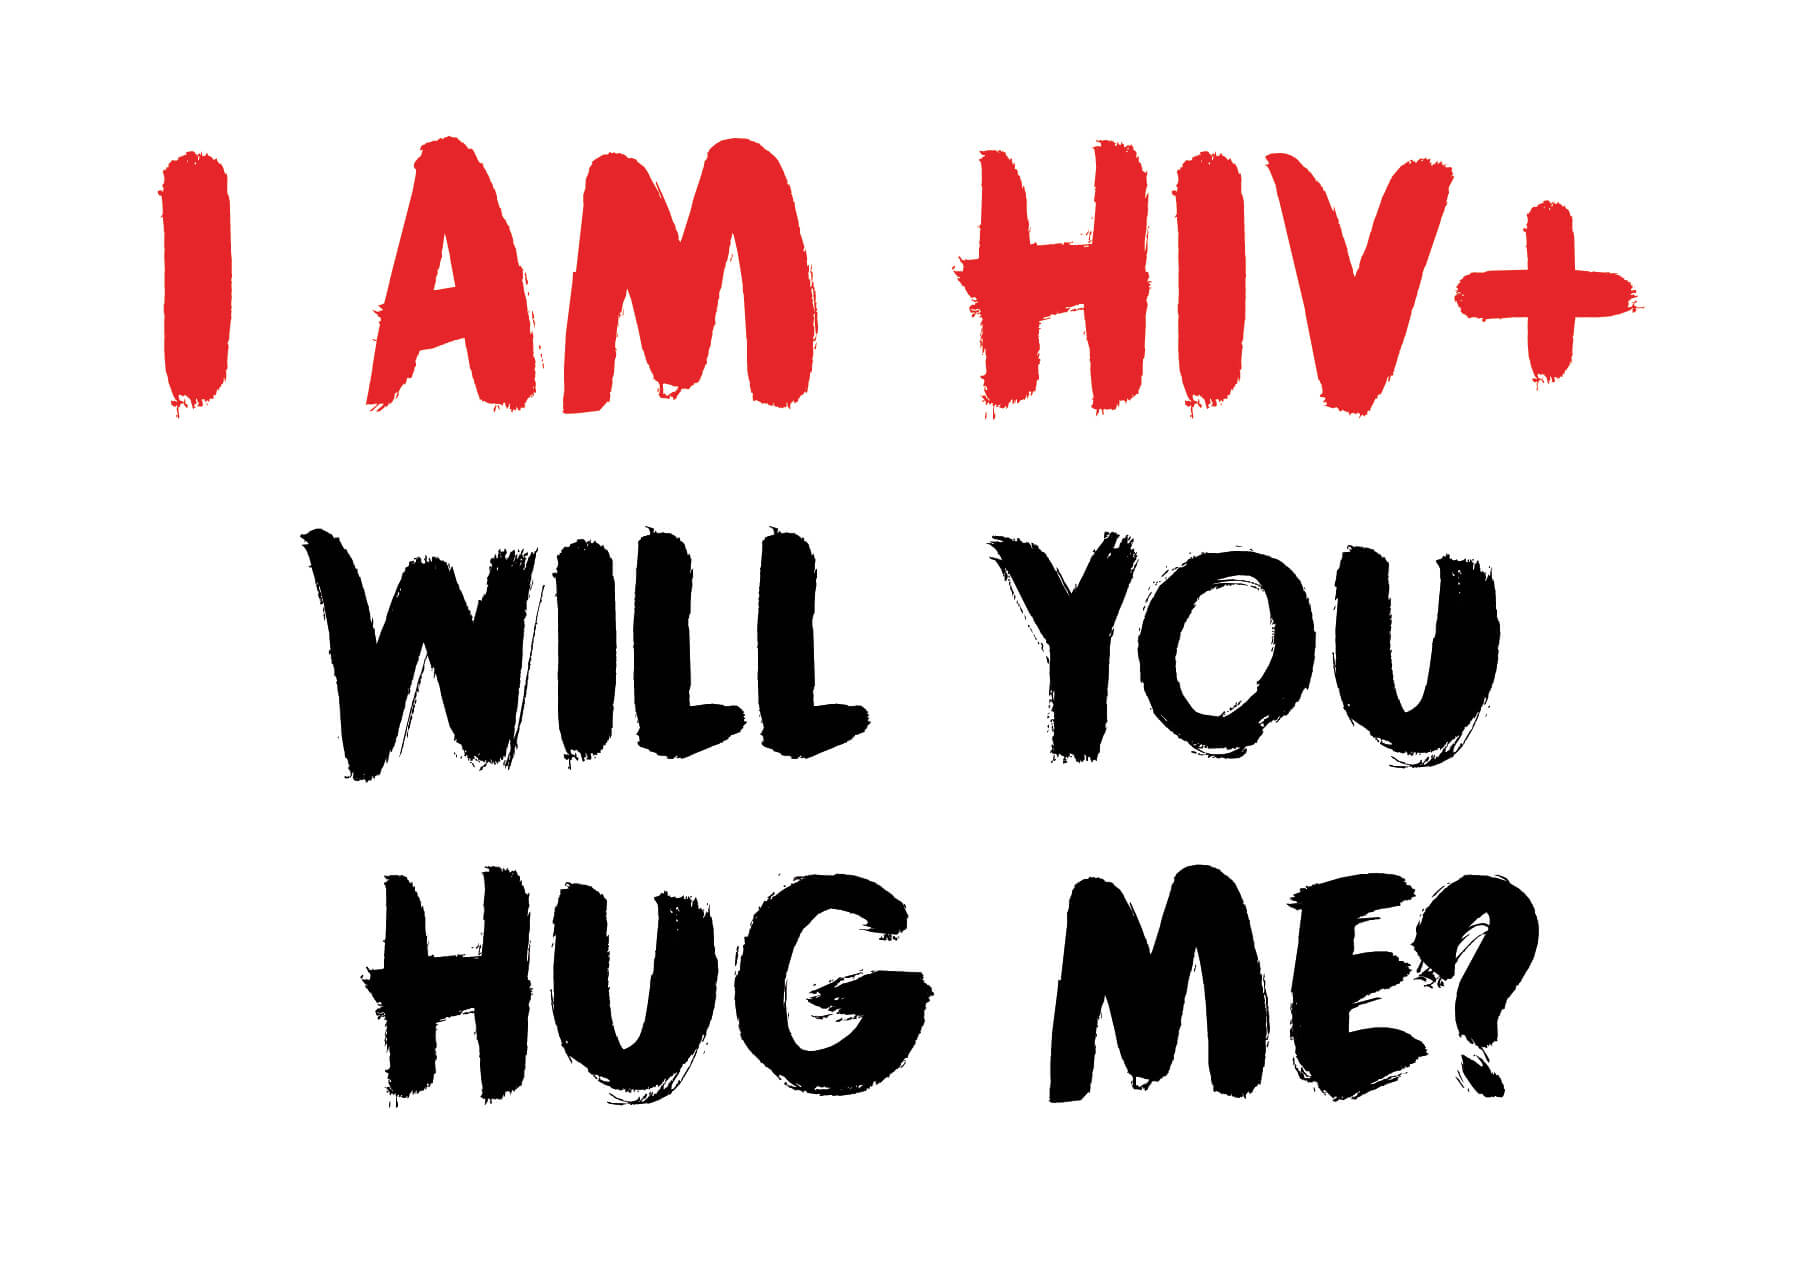 I am HIV+. Will you hug me?